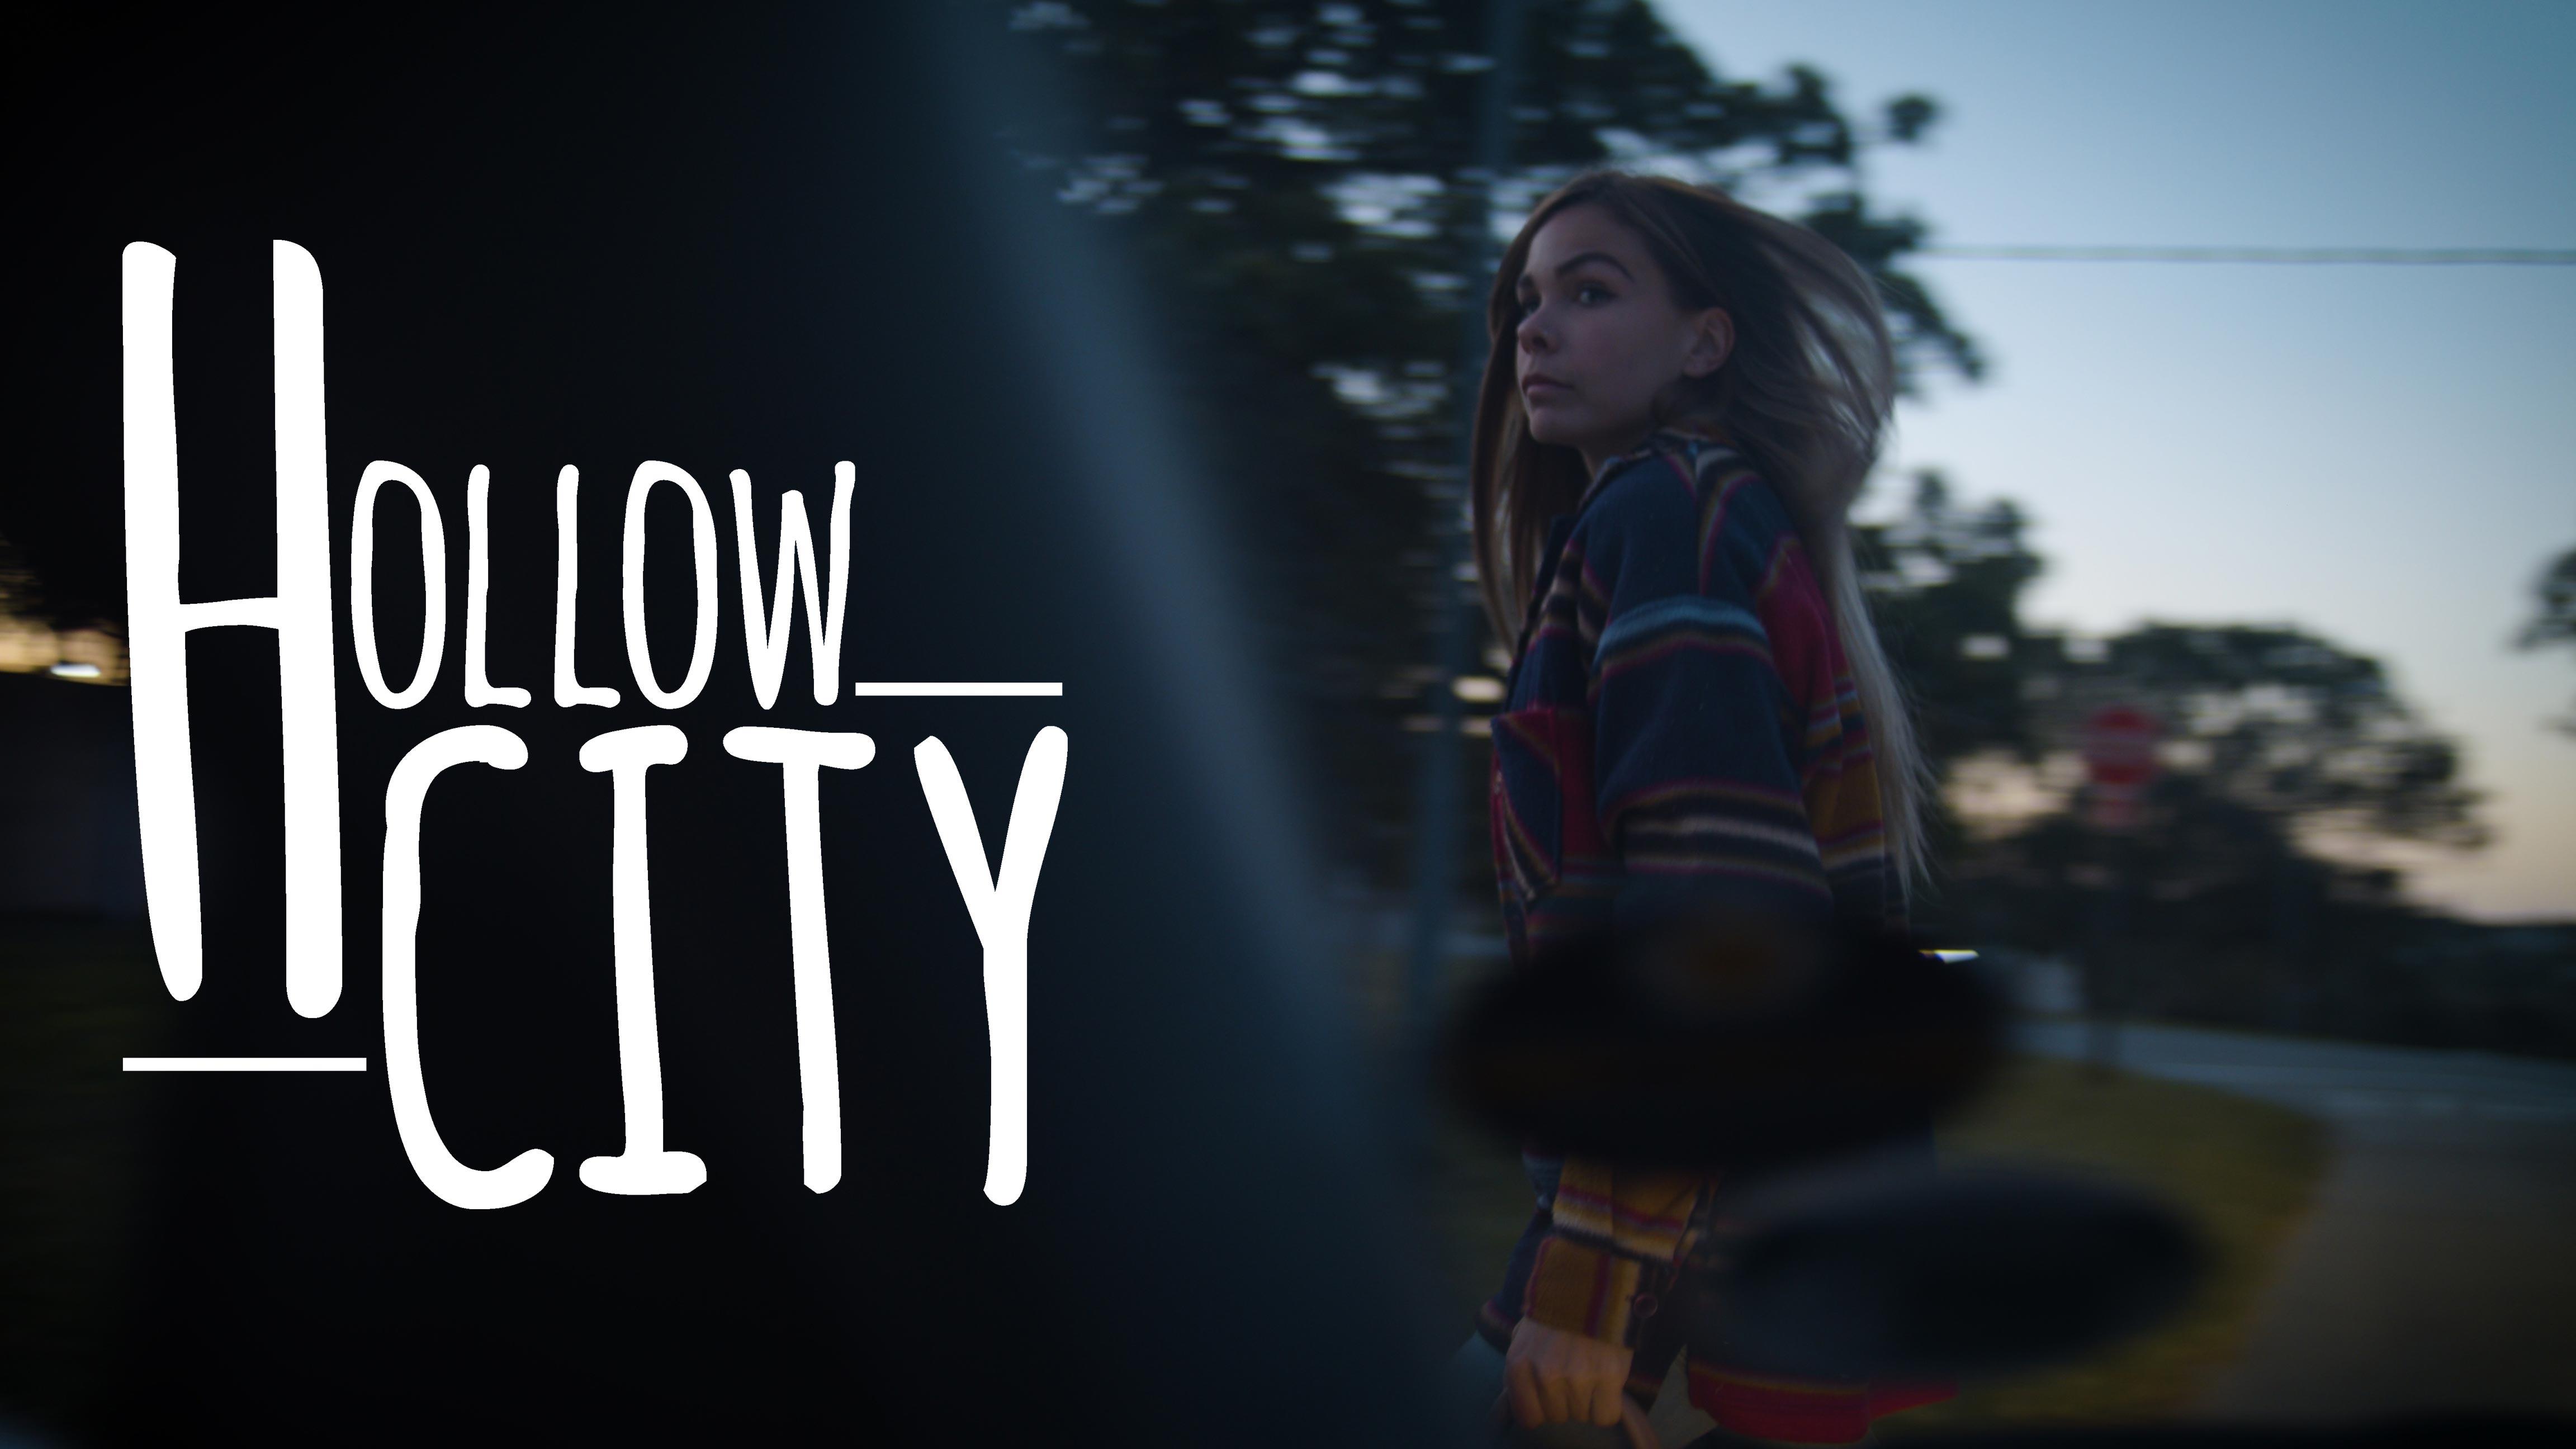 Hollow City - My RØDE Reel 2020